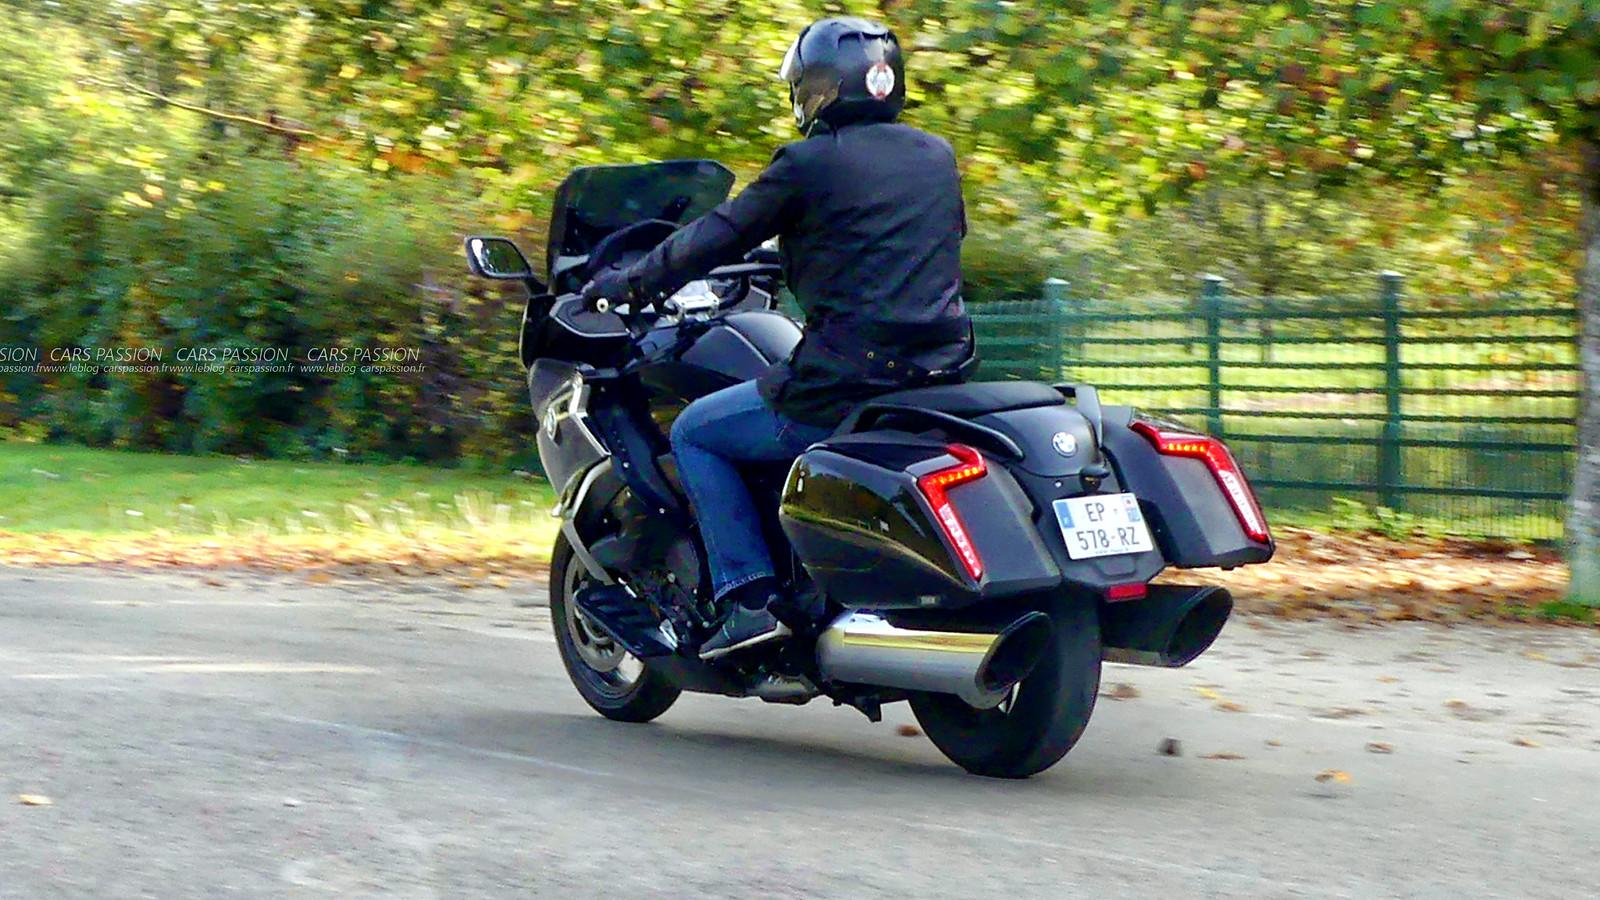 Essai moto BMW K16100B Bagger 2017